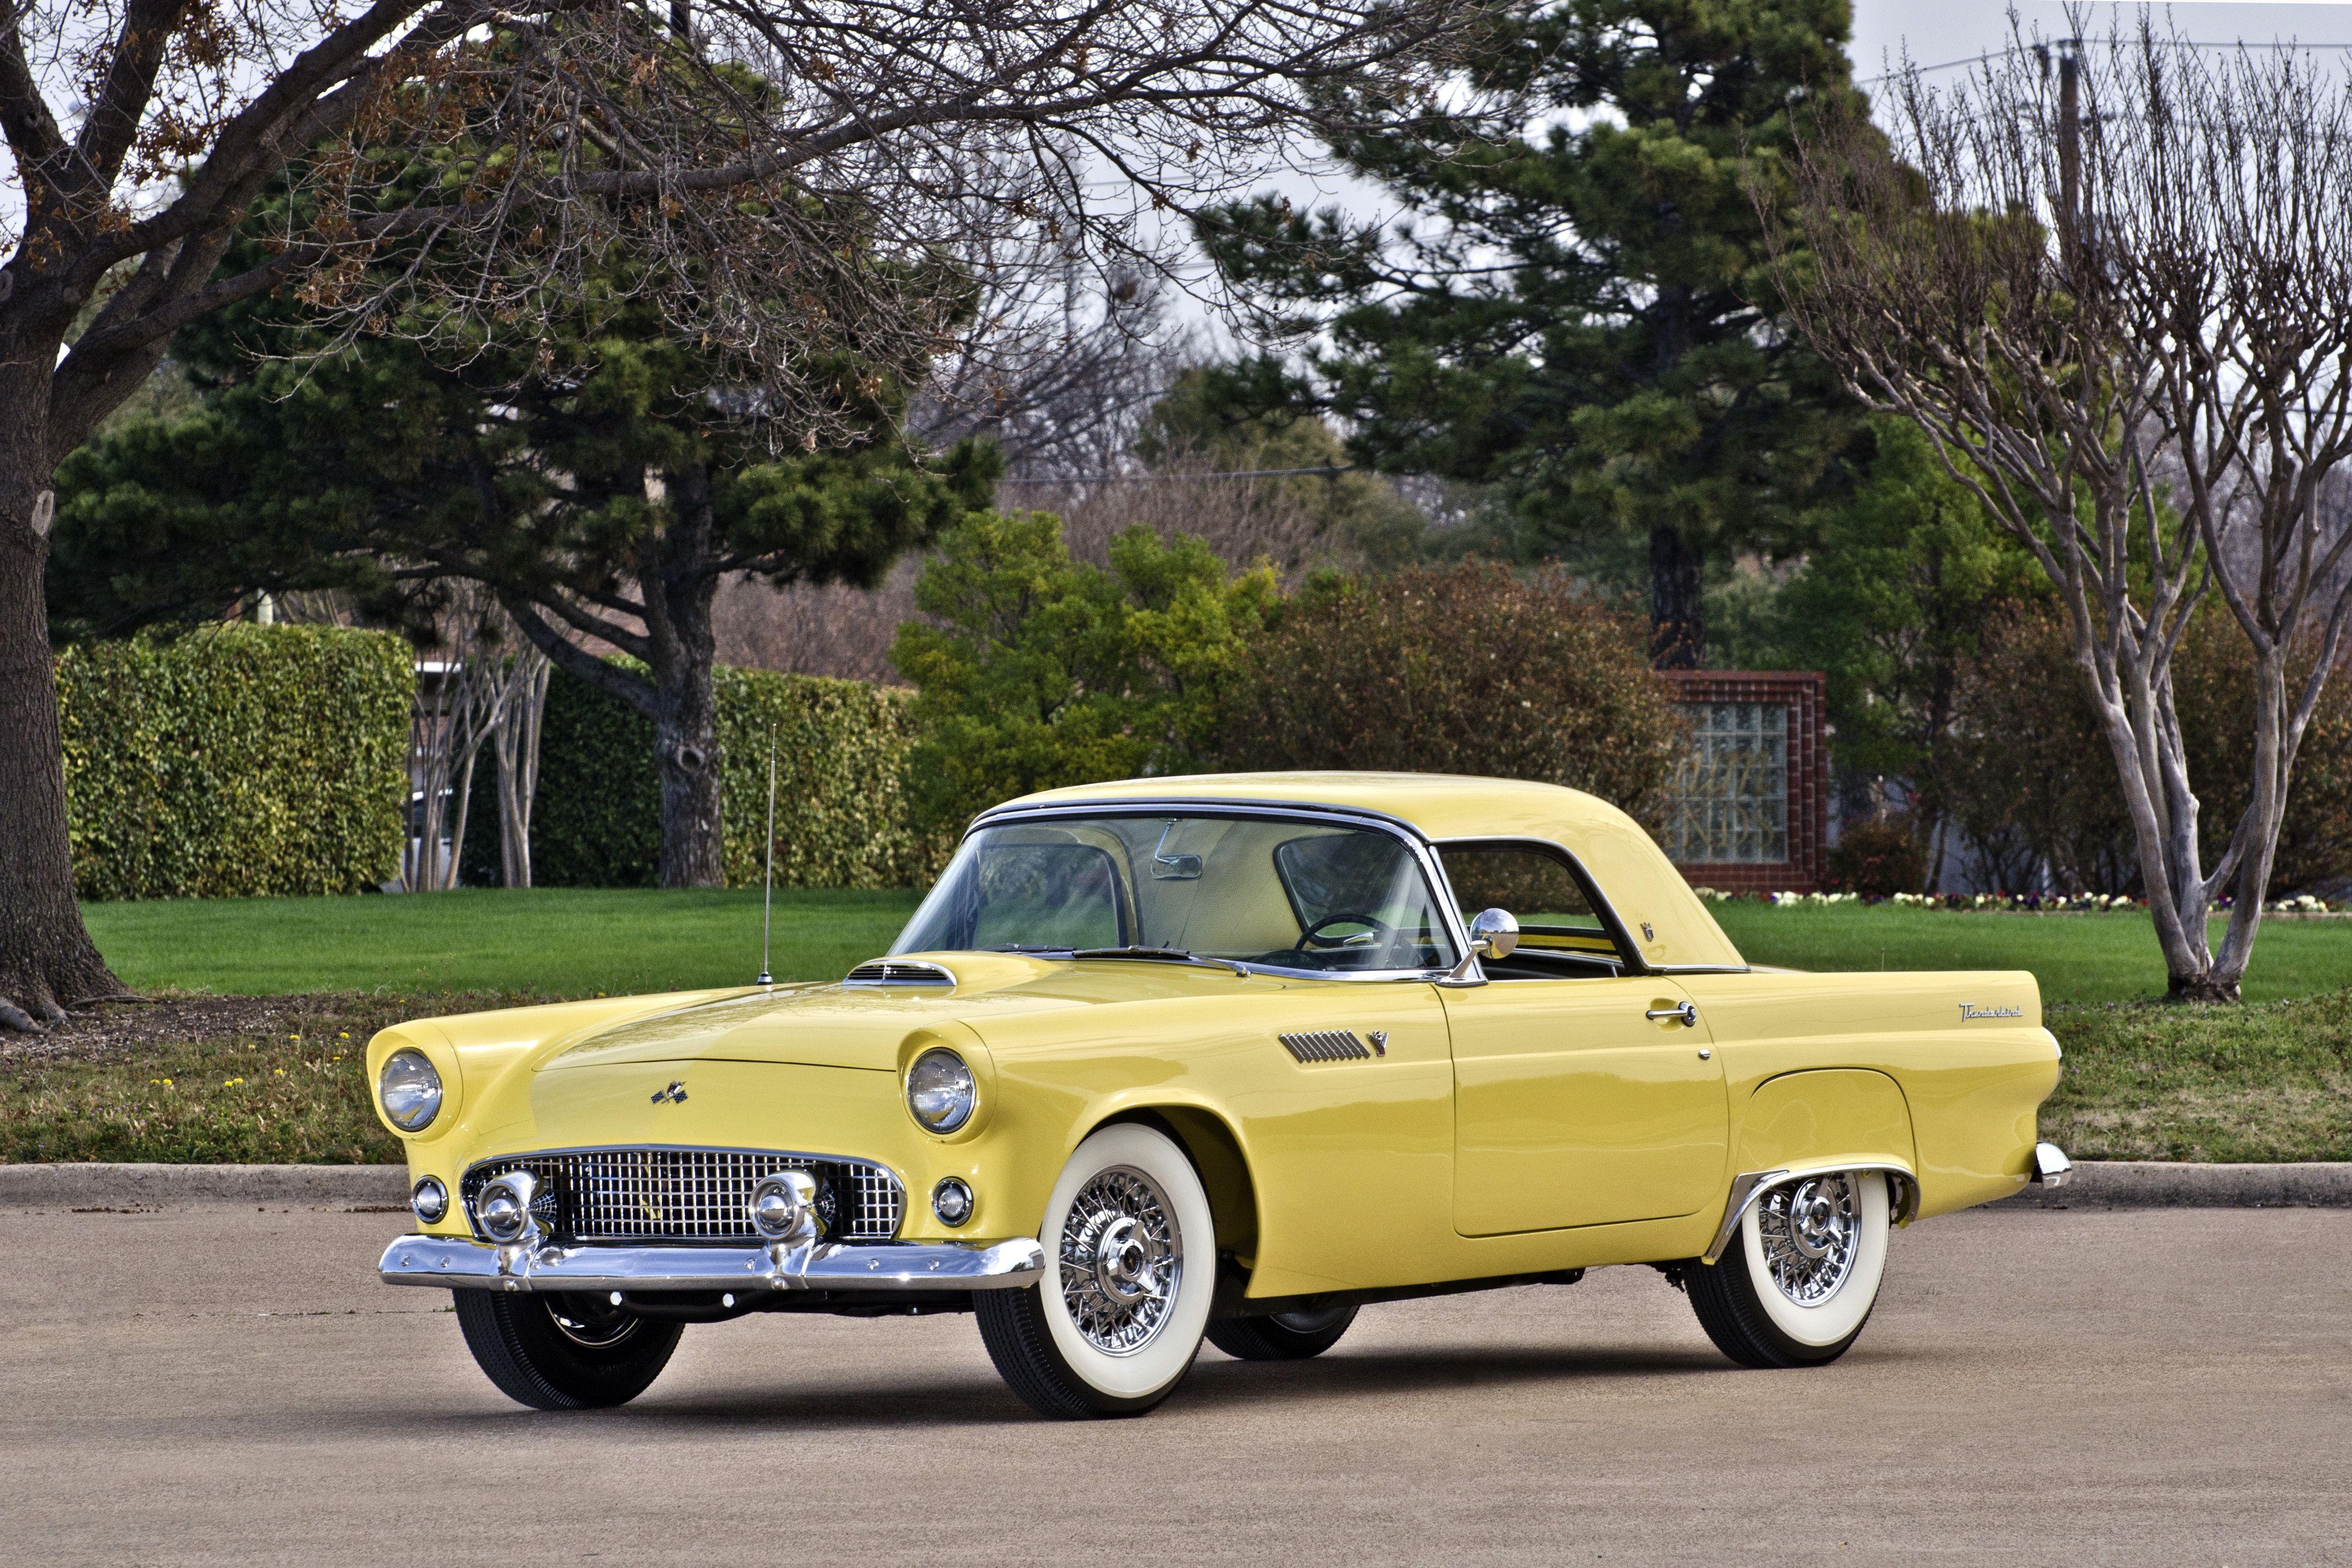 1955 Ford Thunderbird Maintenance restoration of old vintage